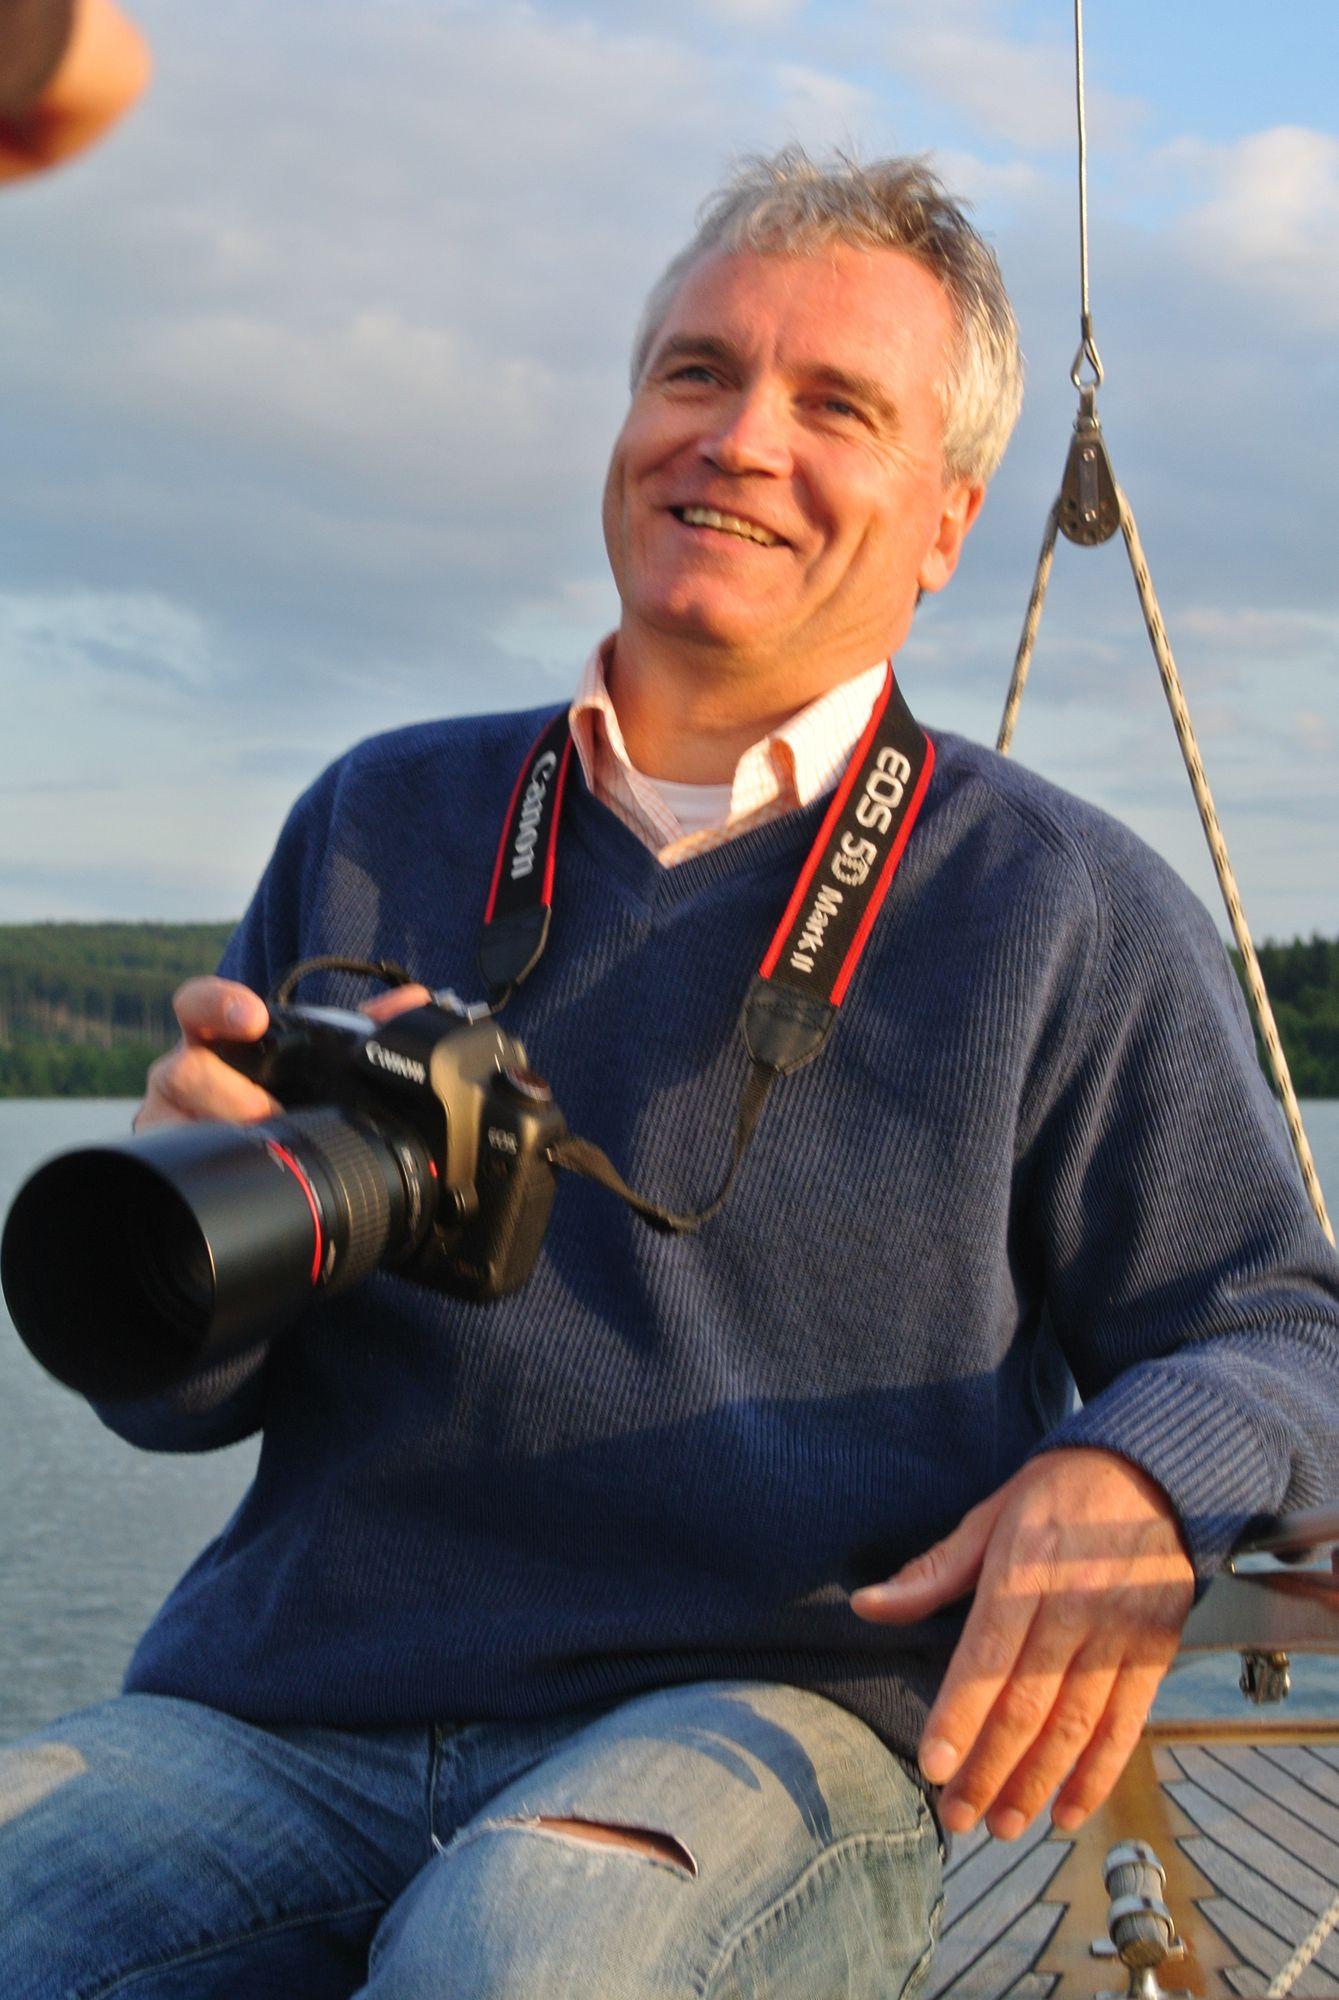 Fotograf Svend Krumnacker 2012 Canon 5D II